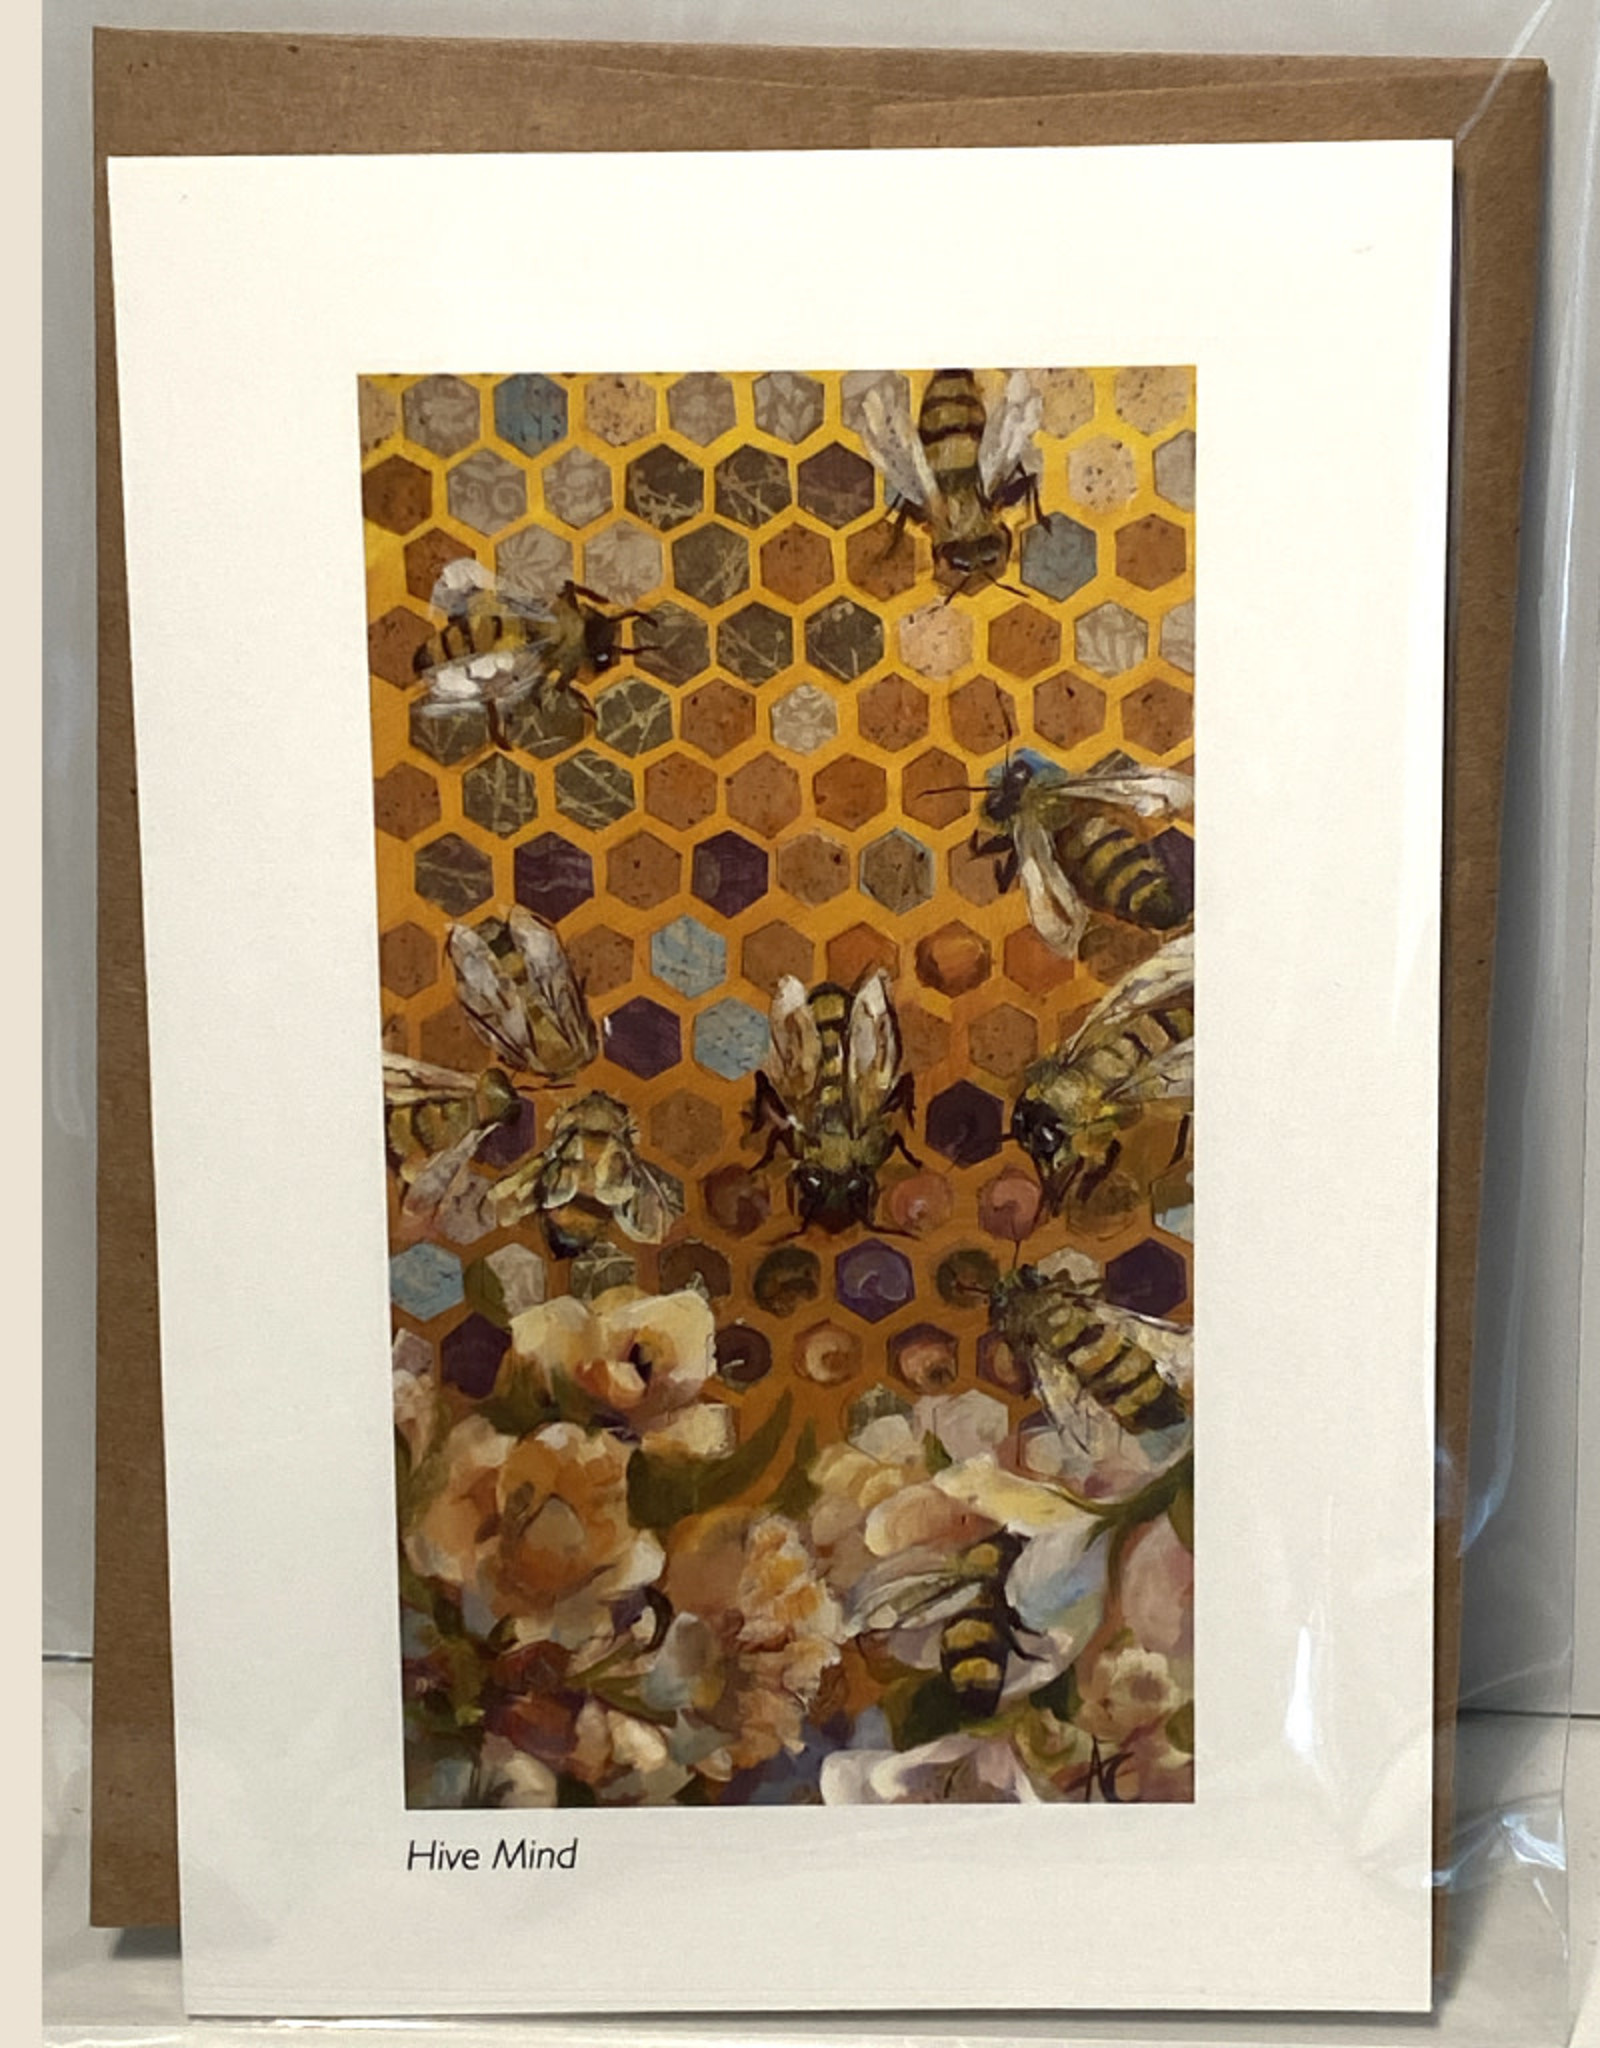 Jennifer Cook-Chrysos Chrysos Designs Artworks, Hive Mind Greeting Card, 5 x 7